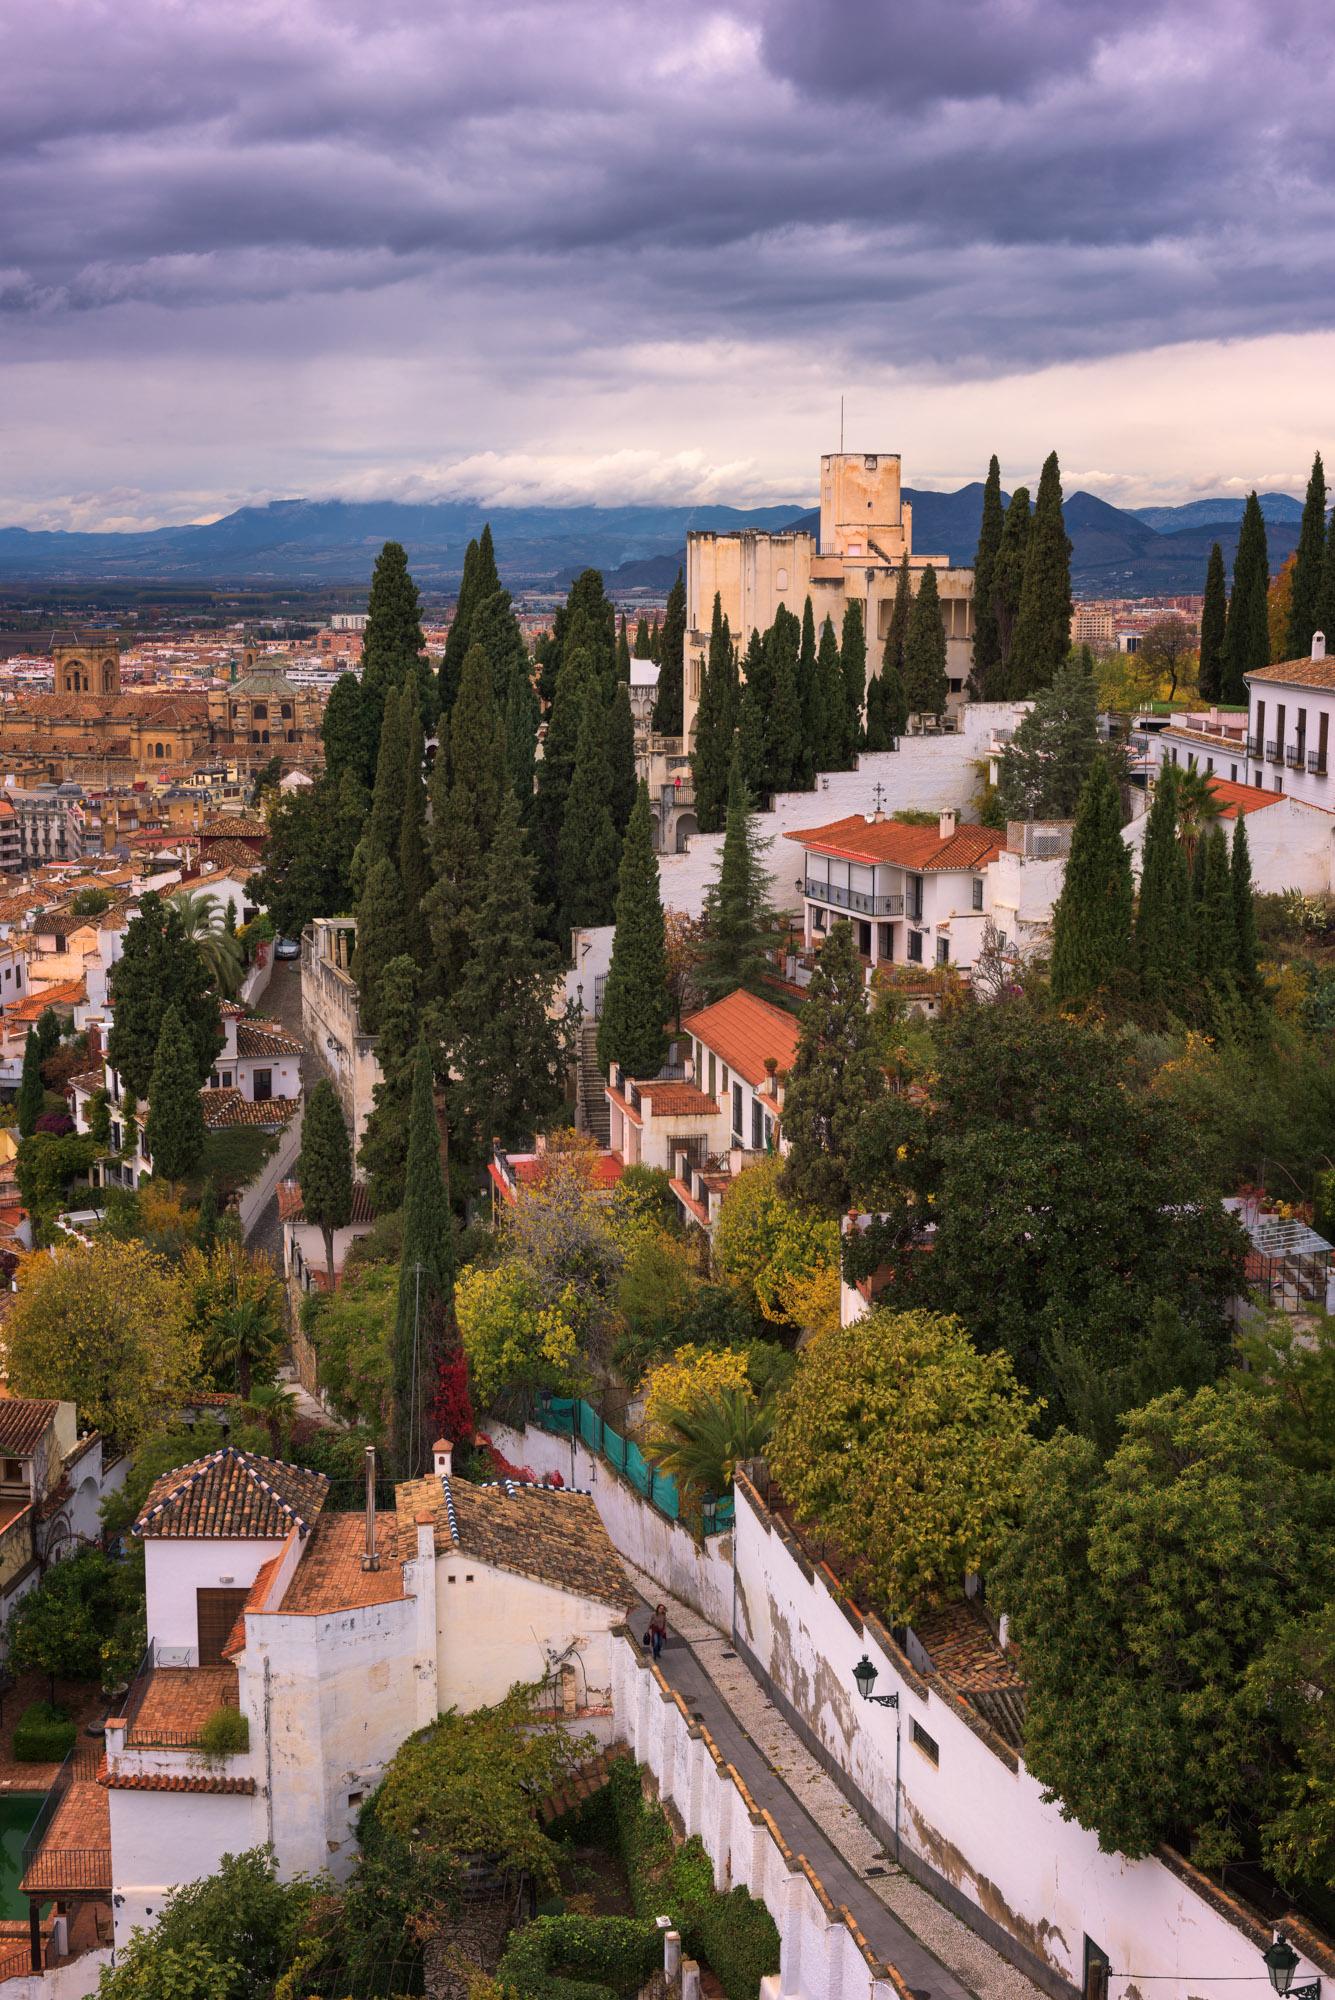 Fundacion Rodriguez-Acosta, Granada Skyline, Spain